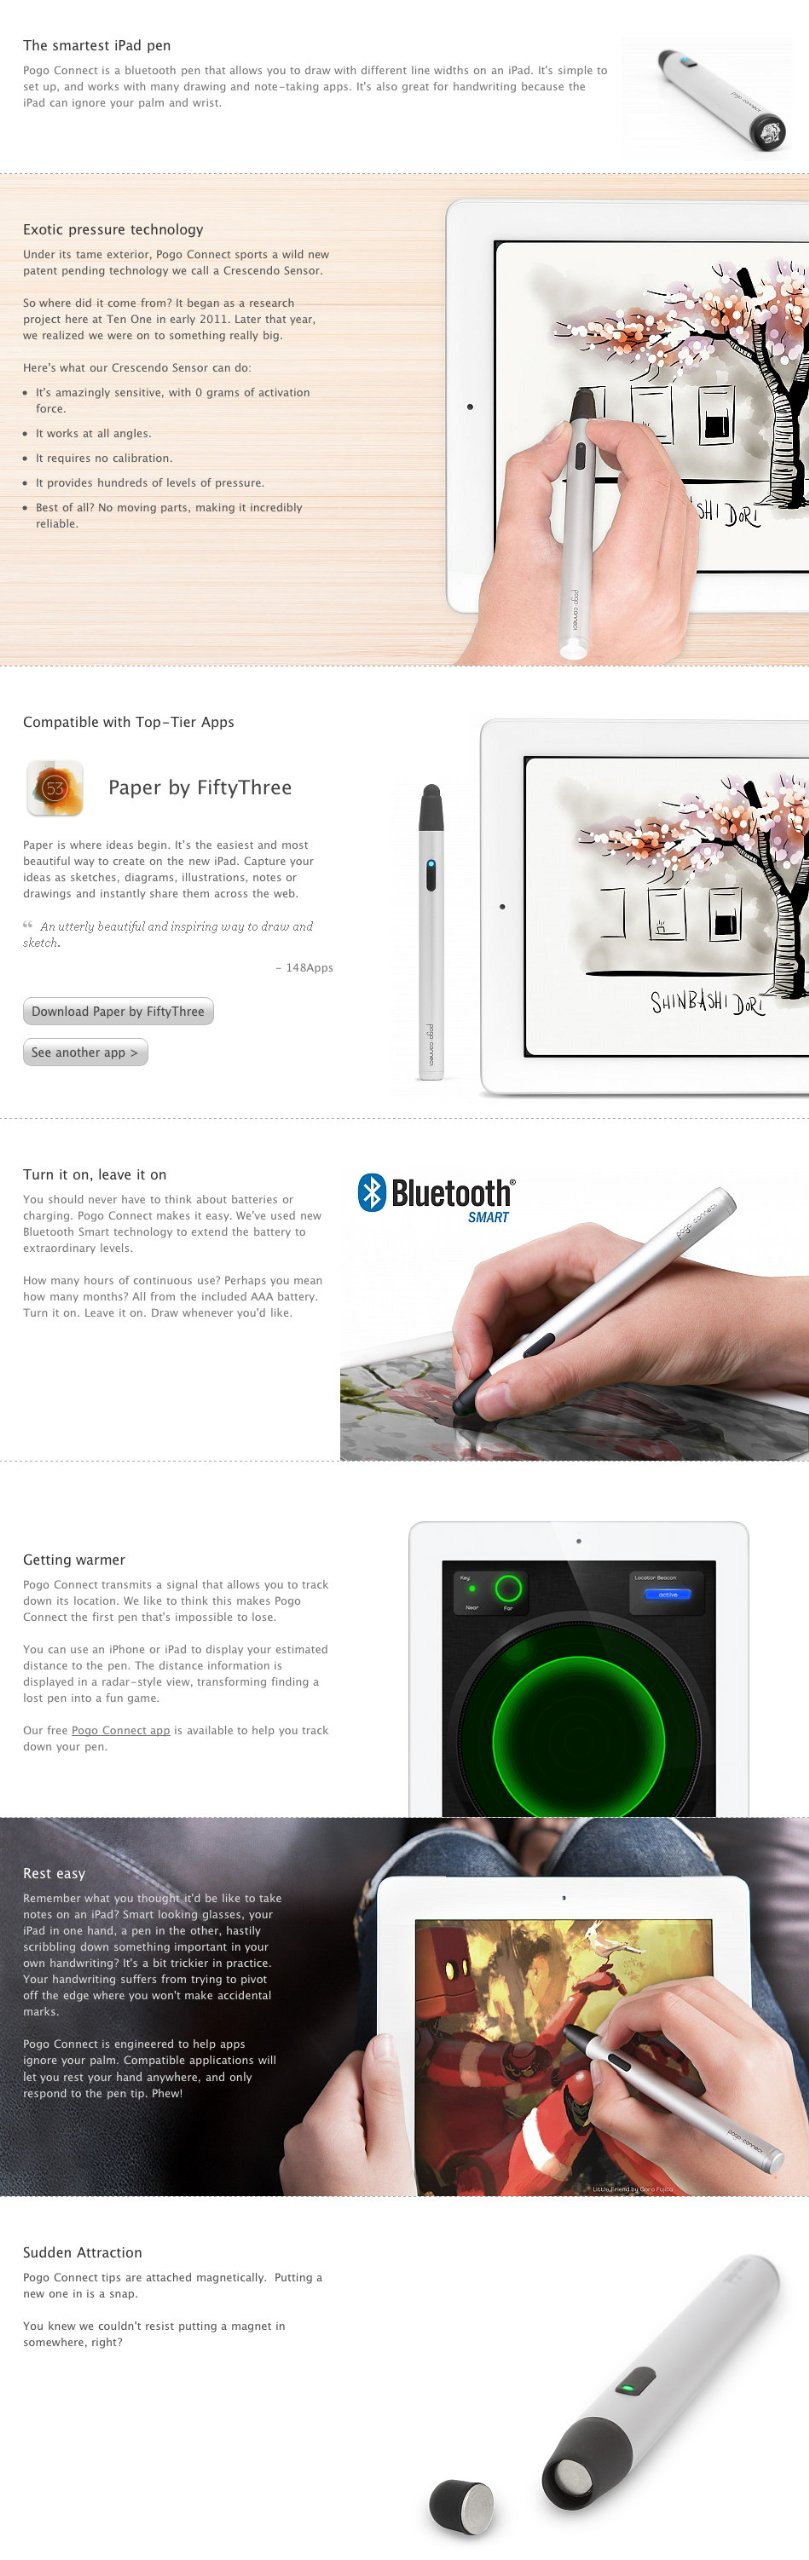 Ten One Design - T1-PGCT-302 - Pogo Connect 1 Bluetooth 4.0 Smart Pen, for iPad 3/4